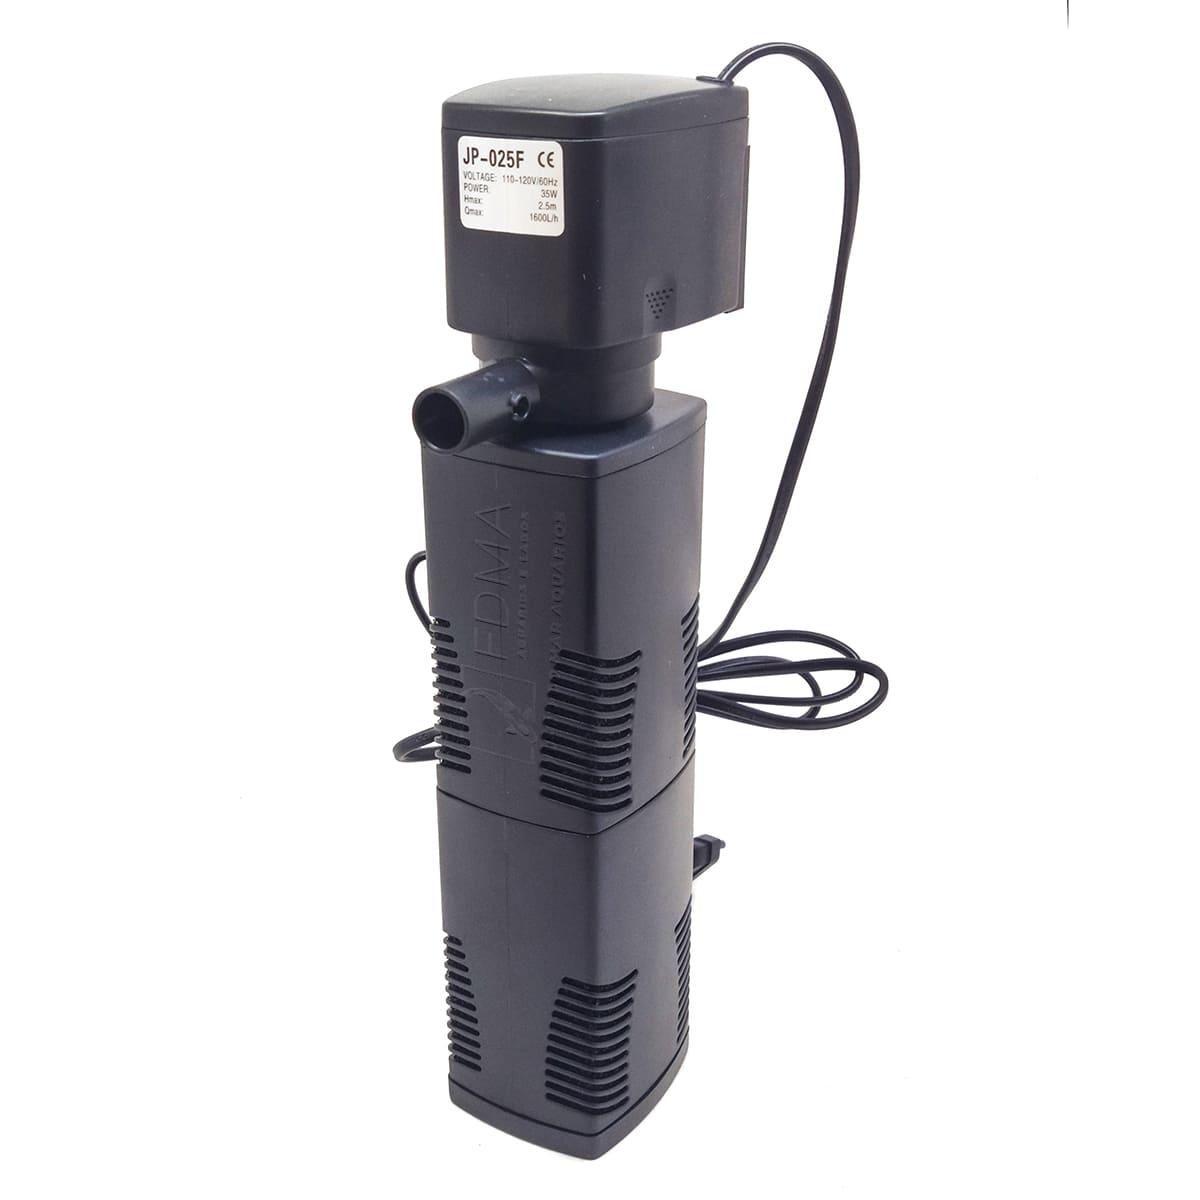 Filtro Interno para Aquários Sunsun Jp-025f - 1600l/h